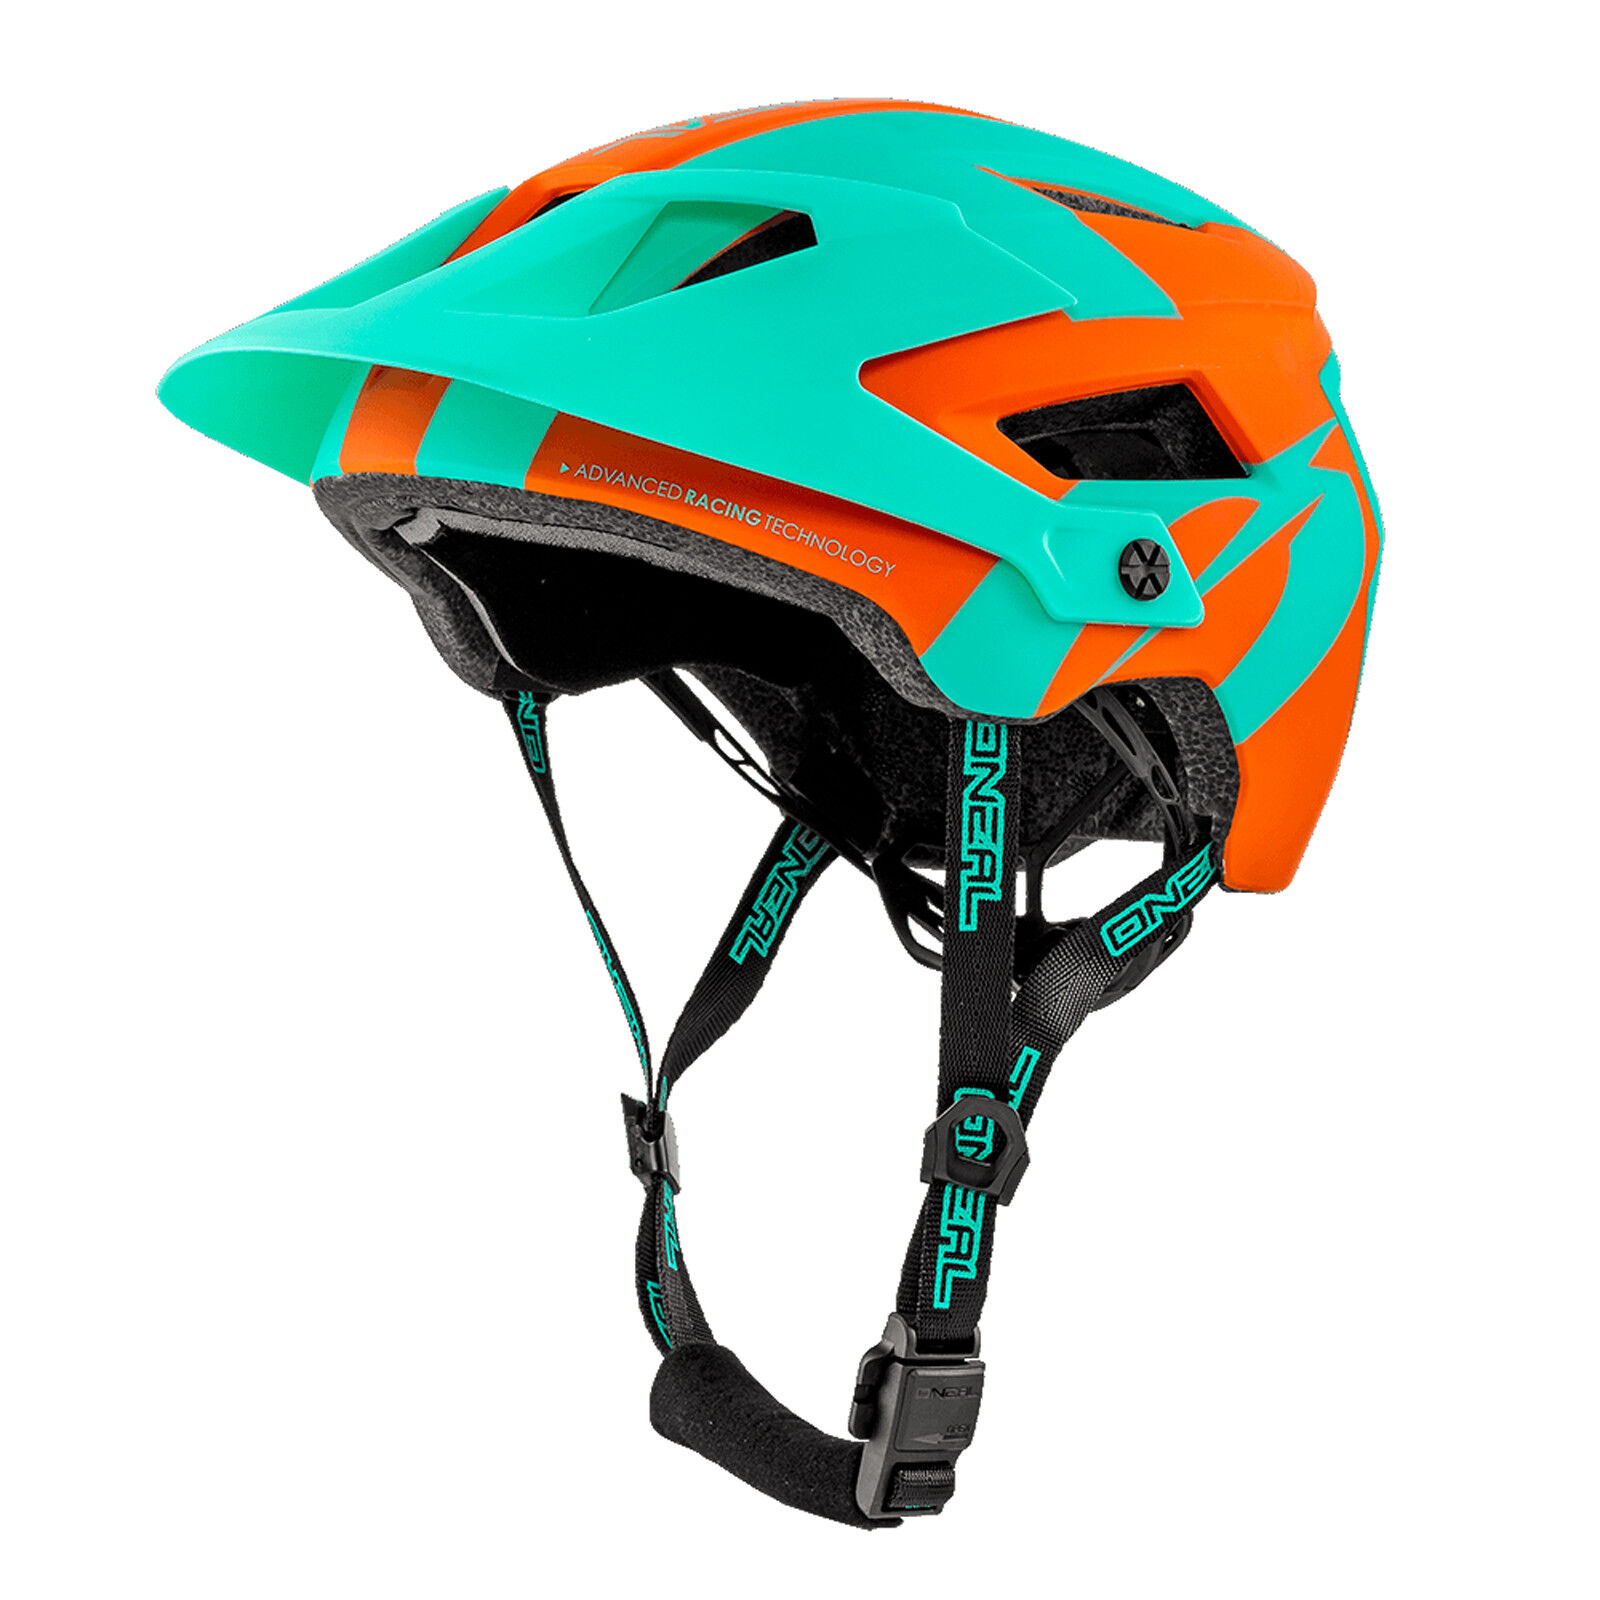 O 'Neal Defender 2.0 Sliver ALL MOUNTAIN MTB BICICLETTA CASCO arancioneturchese 2019 ONEA